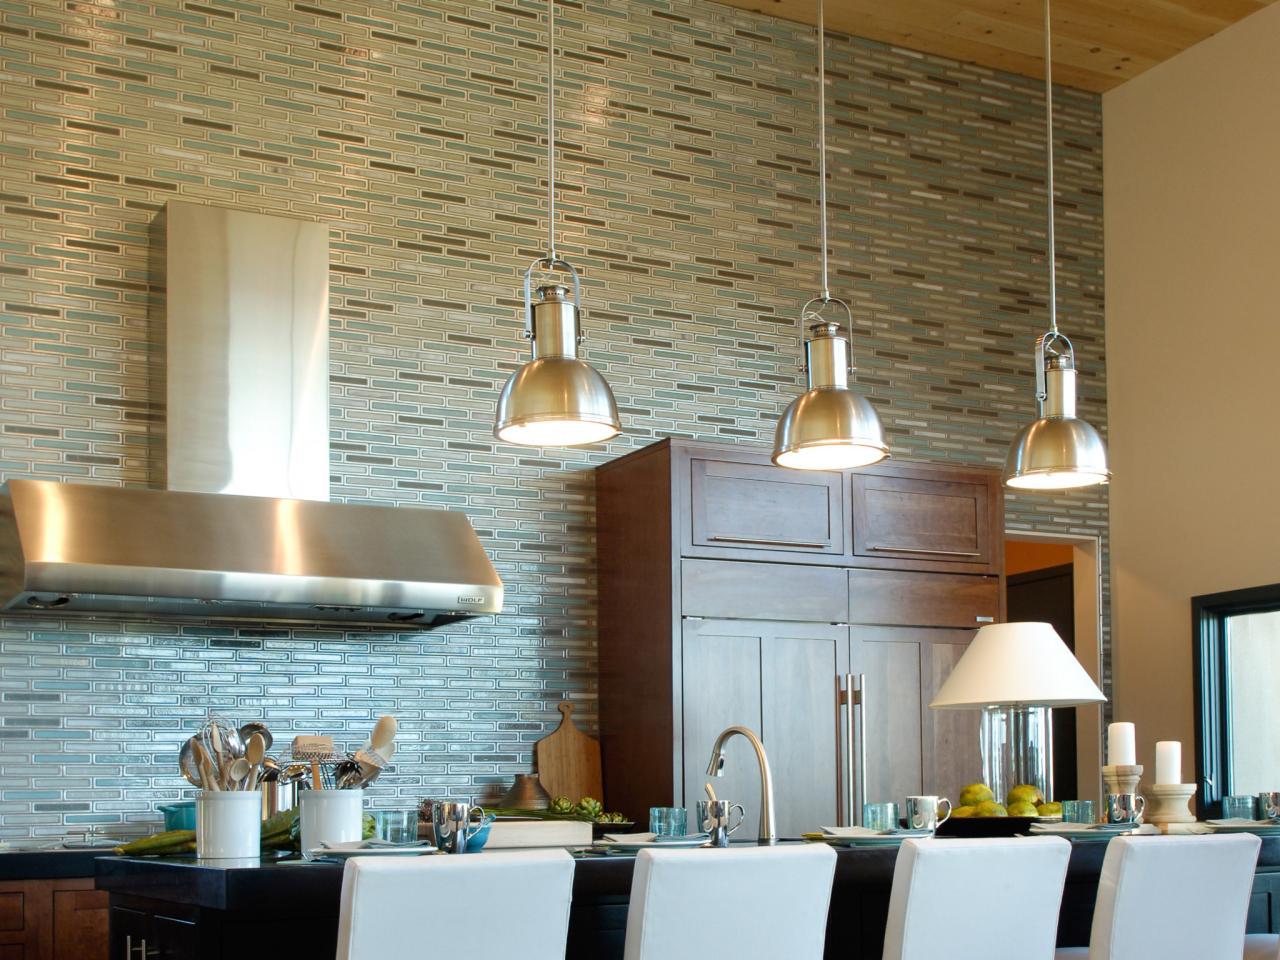 hgtv kitchen backsplash bulletin board 75 ideas for 2019 tile glass metal etc matchstick